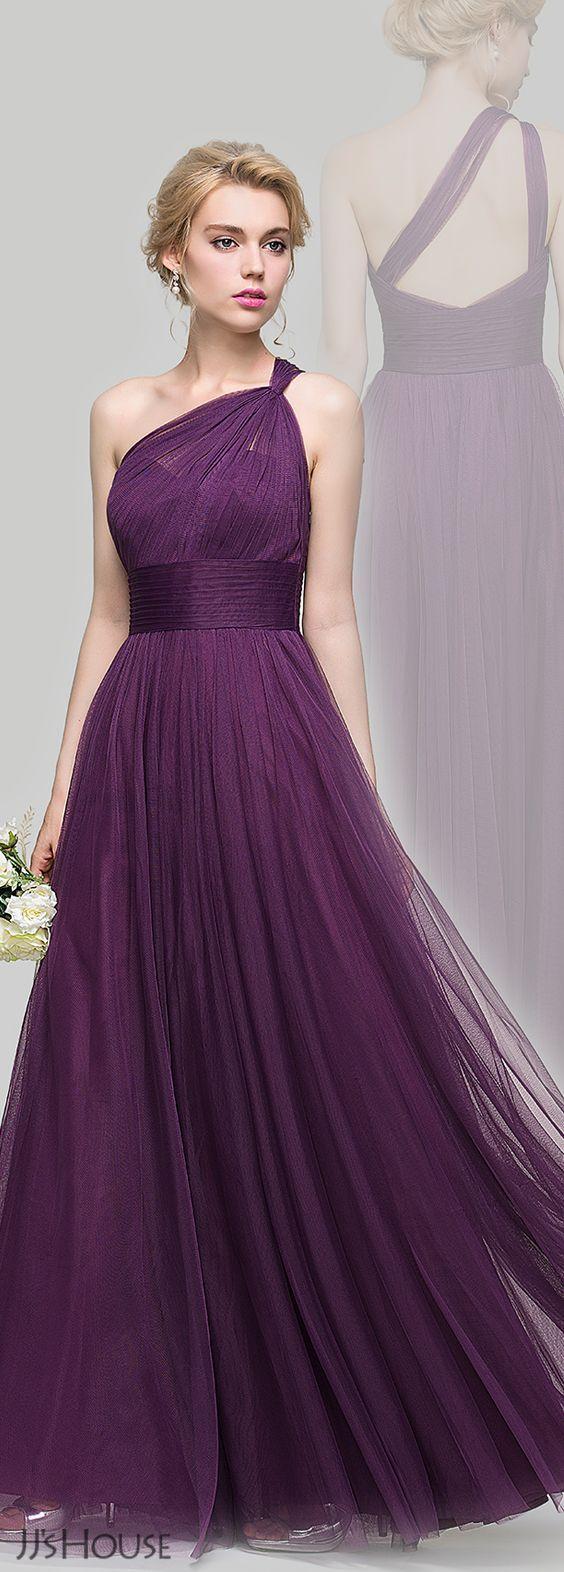 Jjshouse bridesmaid vestidos boda pinterest bridesmaid